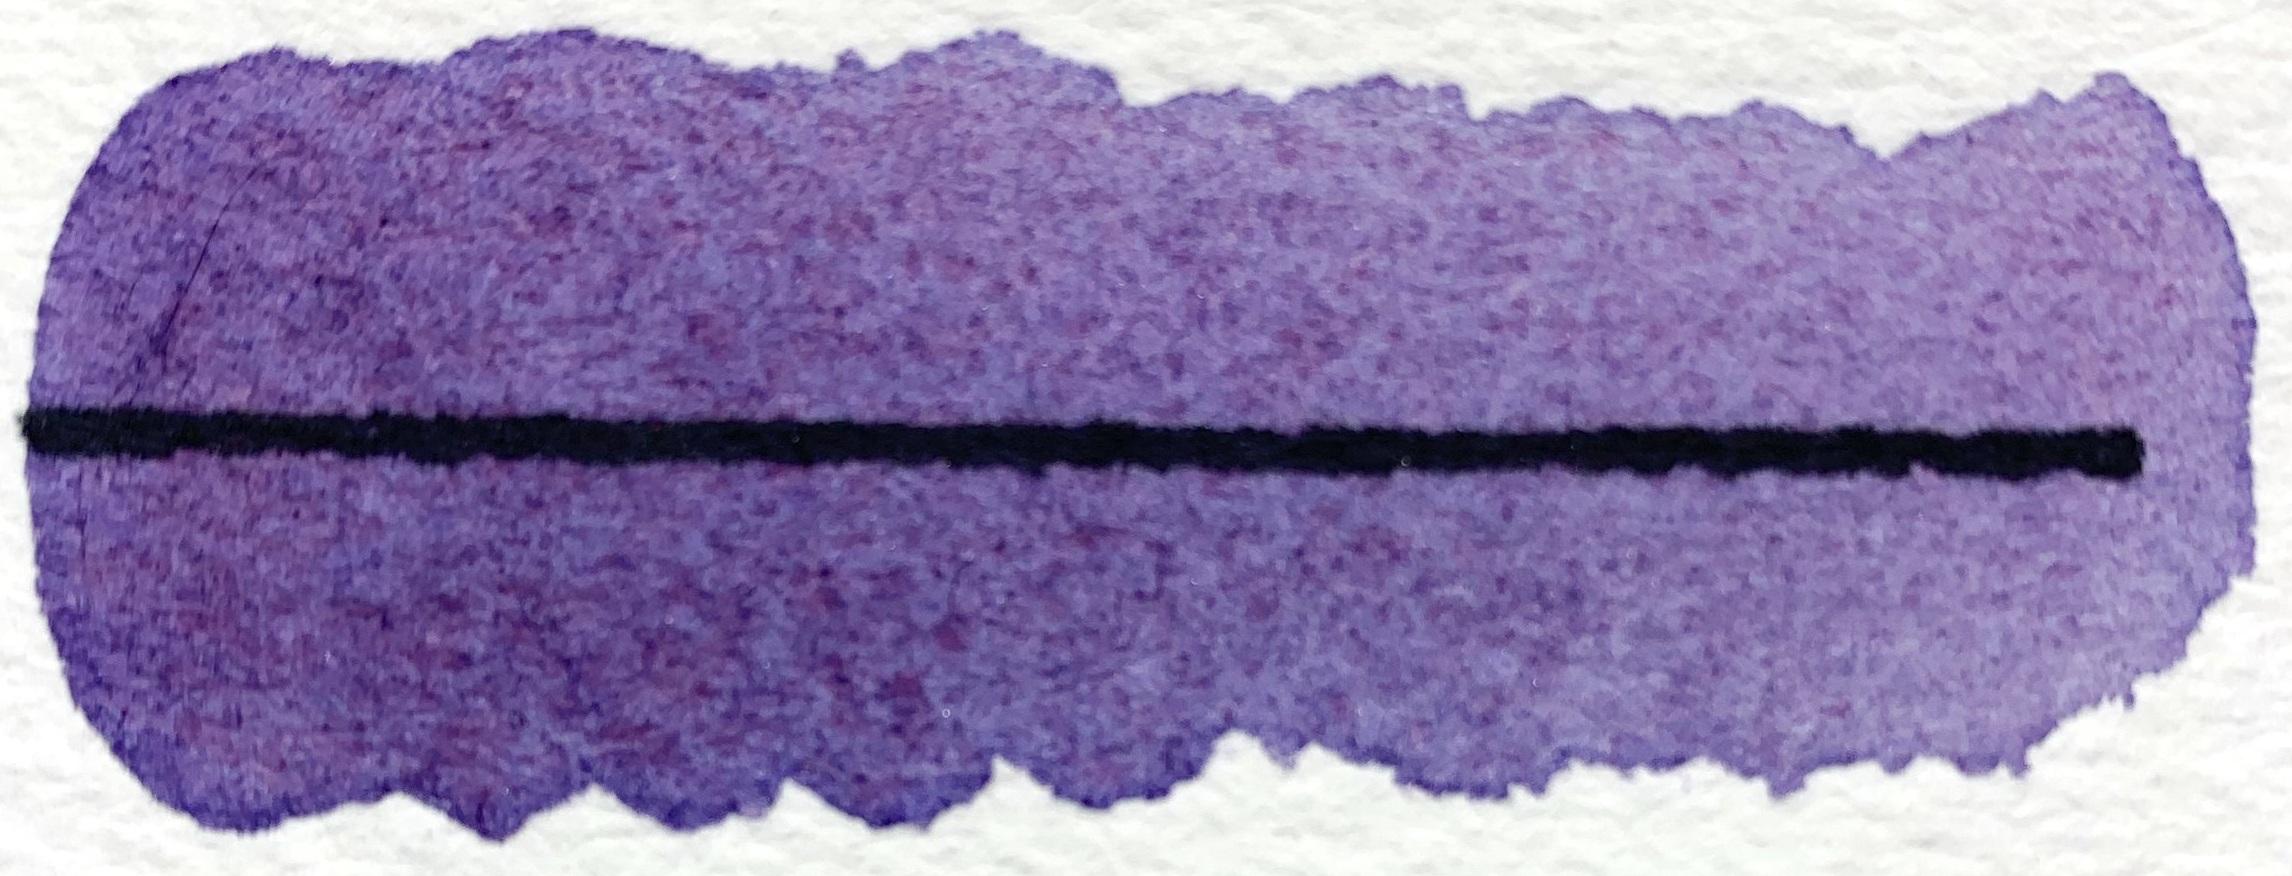 Purple Anthias - PV29, PR112, semitransparent, good lightfastness, moderately staining